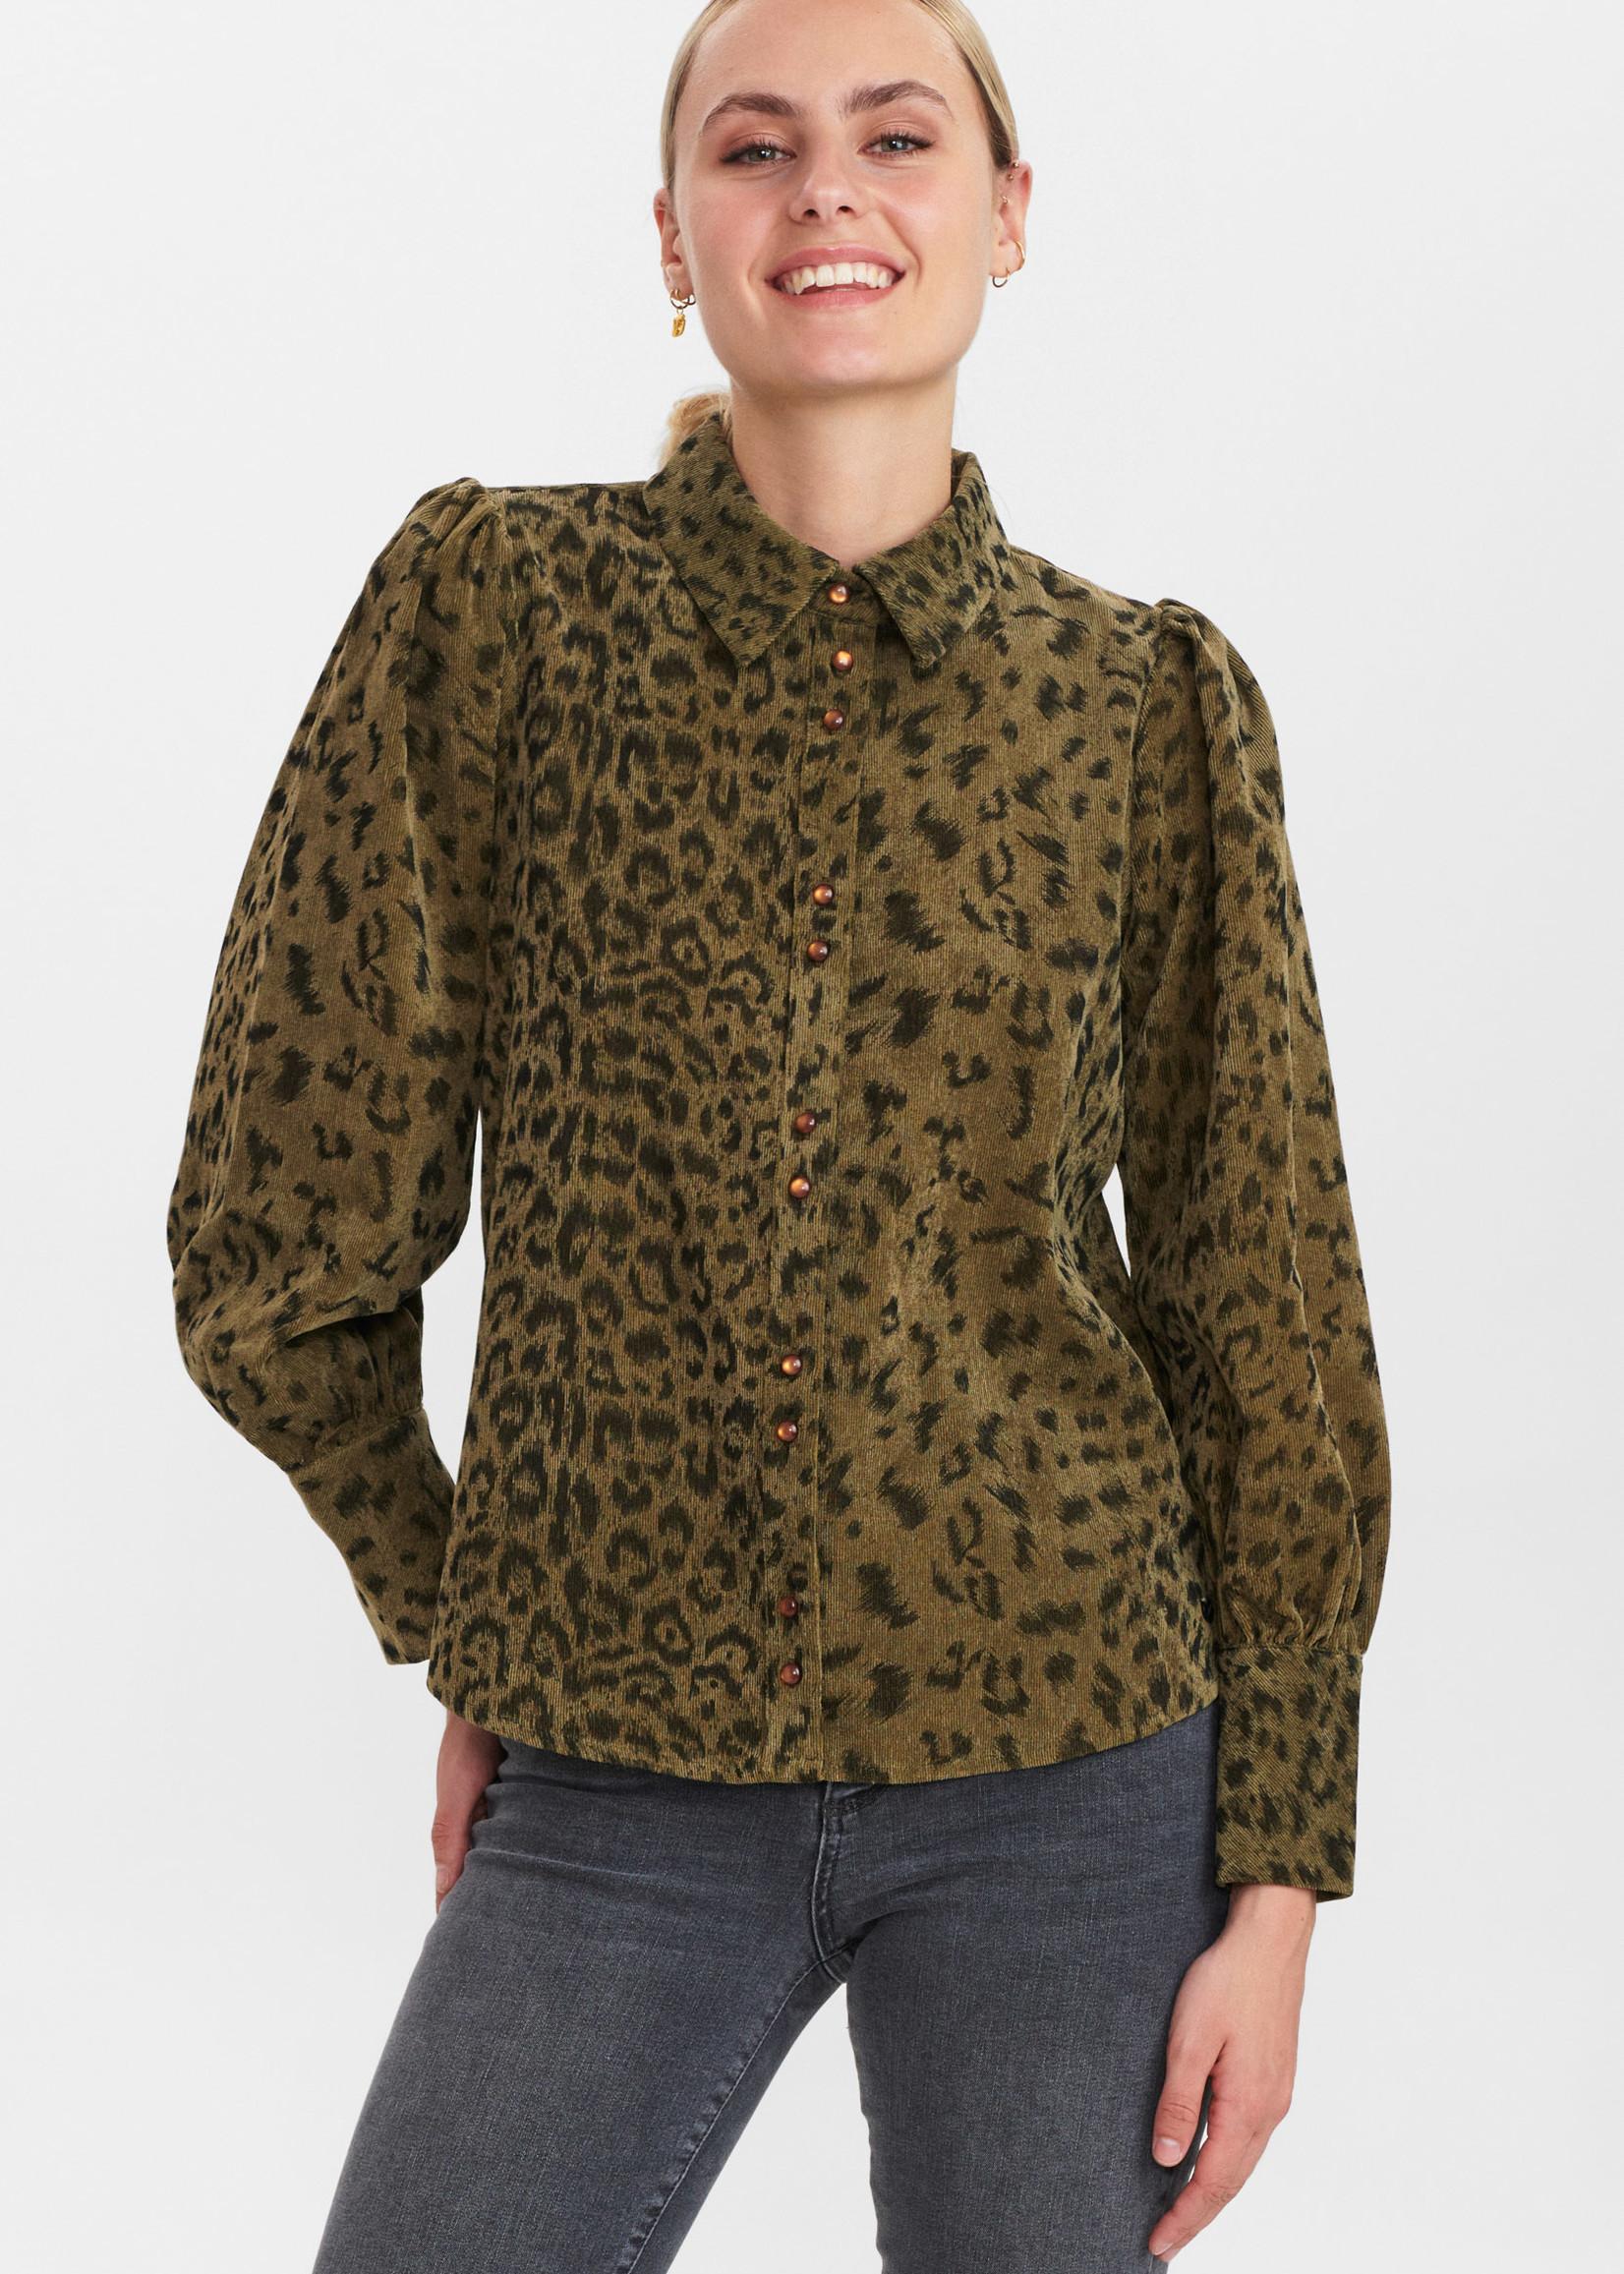 Numph Nuchelsea Shirt